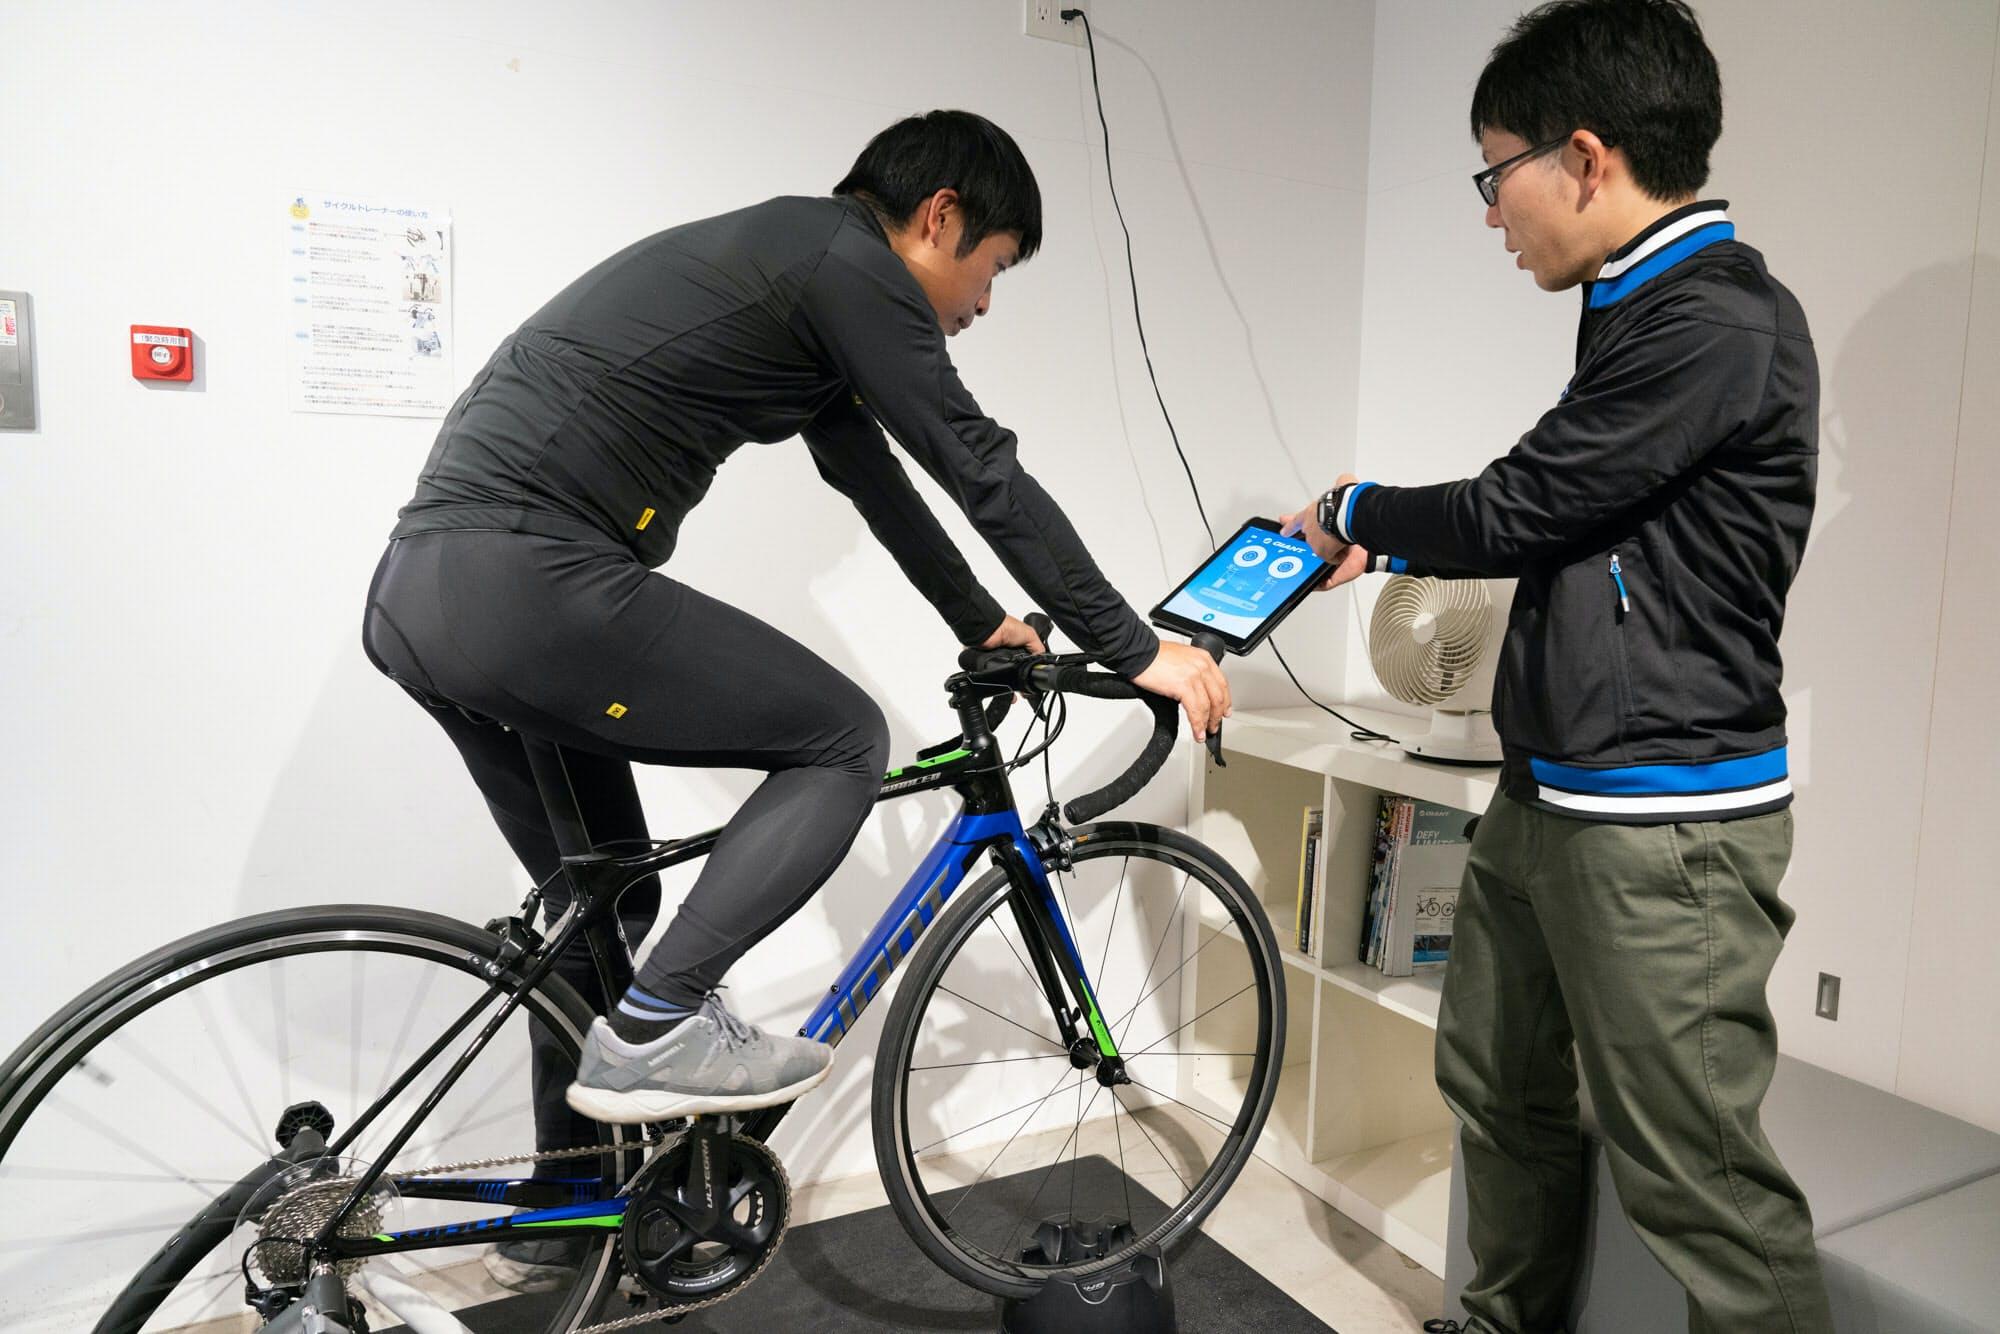 d81b967098 ツーリングや練習に便利 自転車用パワーメーター|MONO TRENDY|NIKKEI STYLE